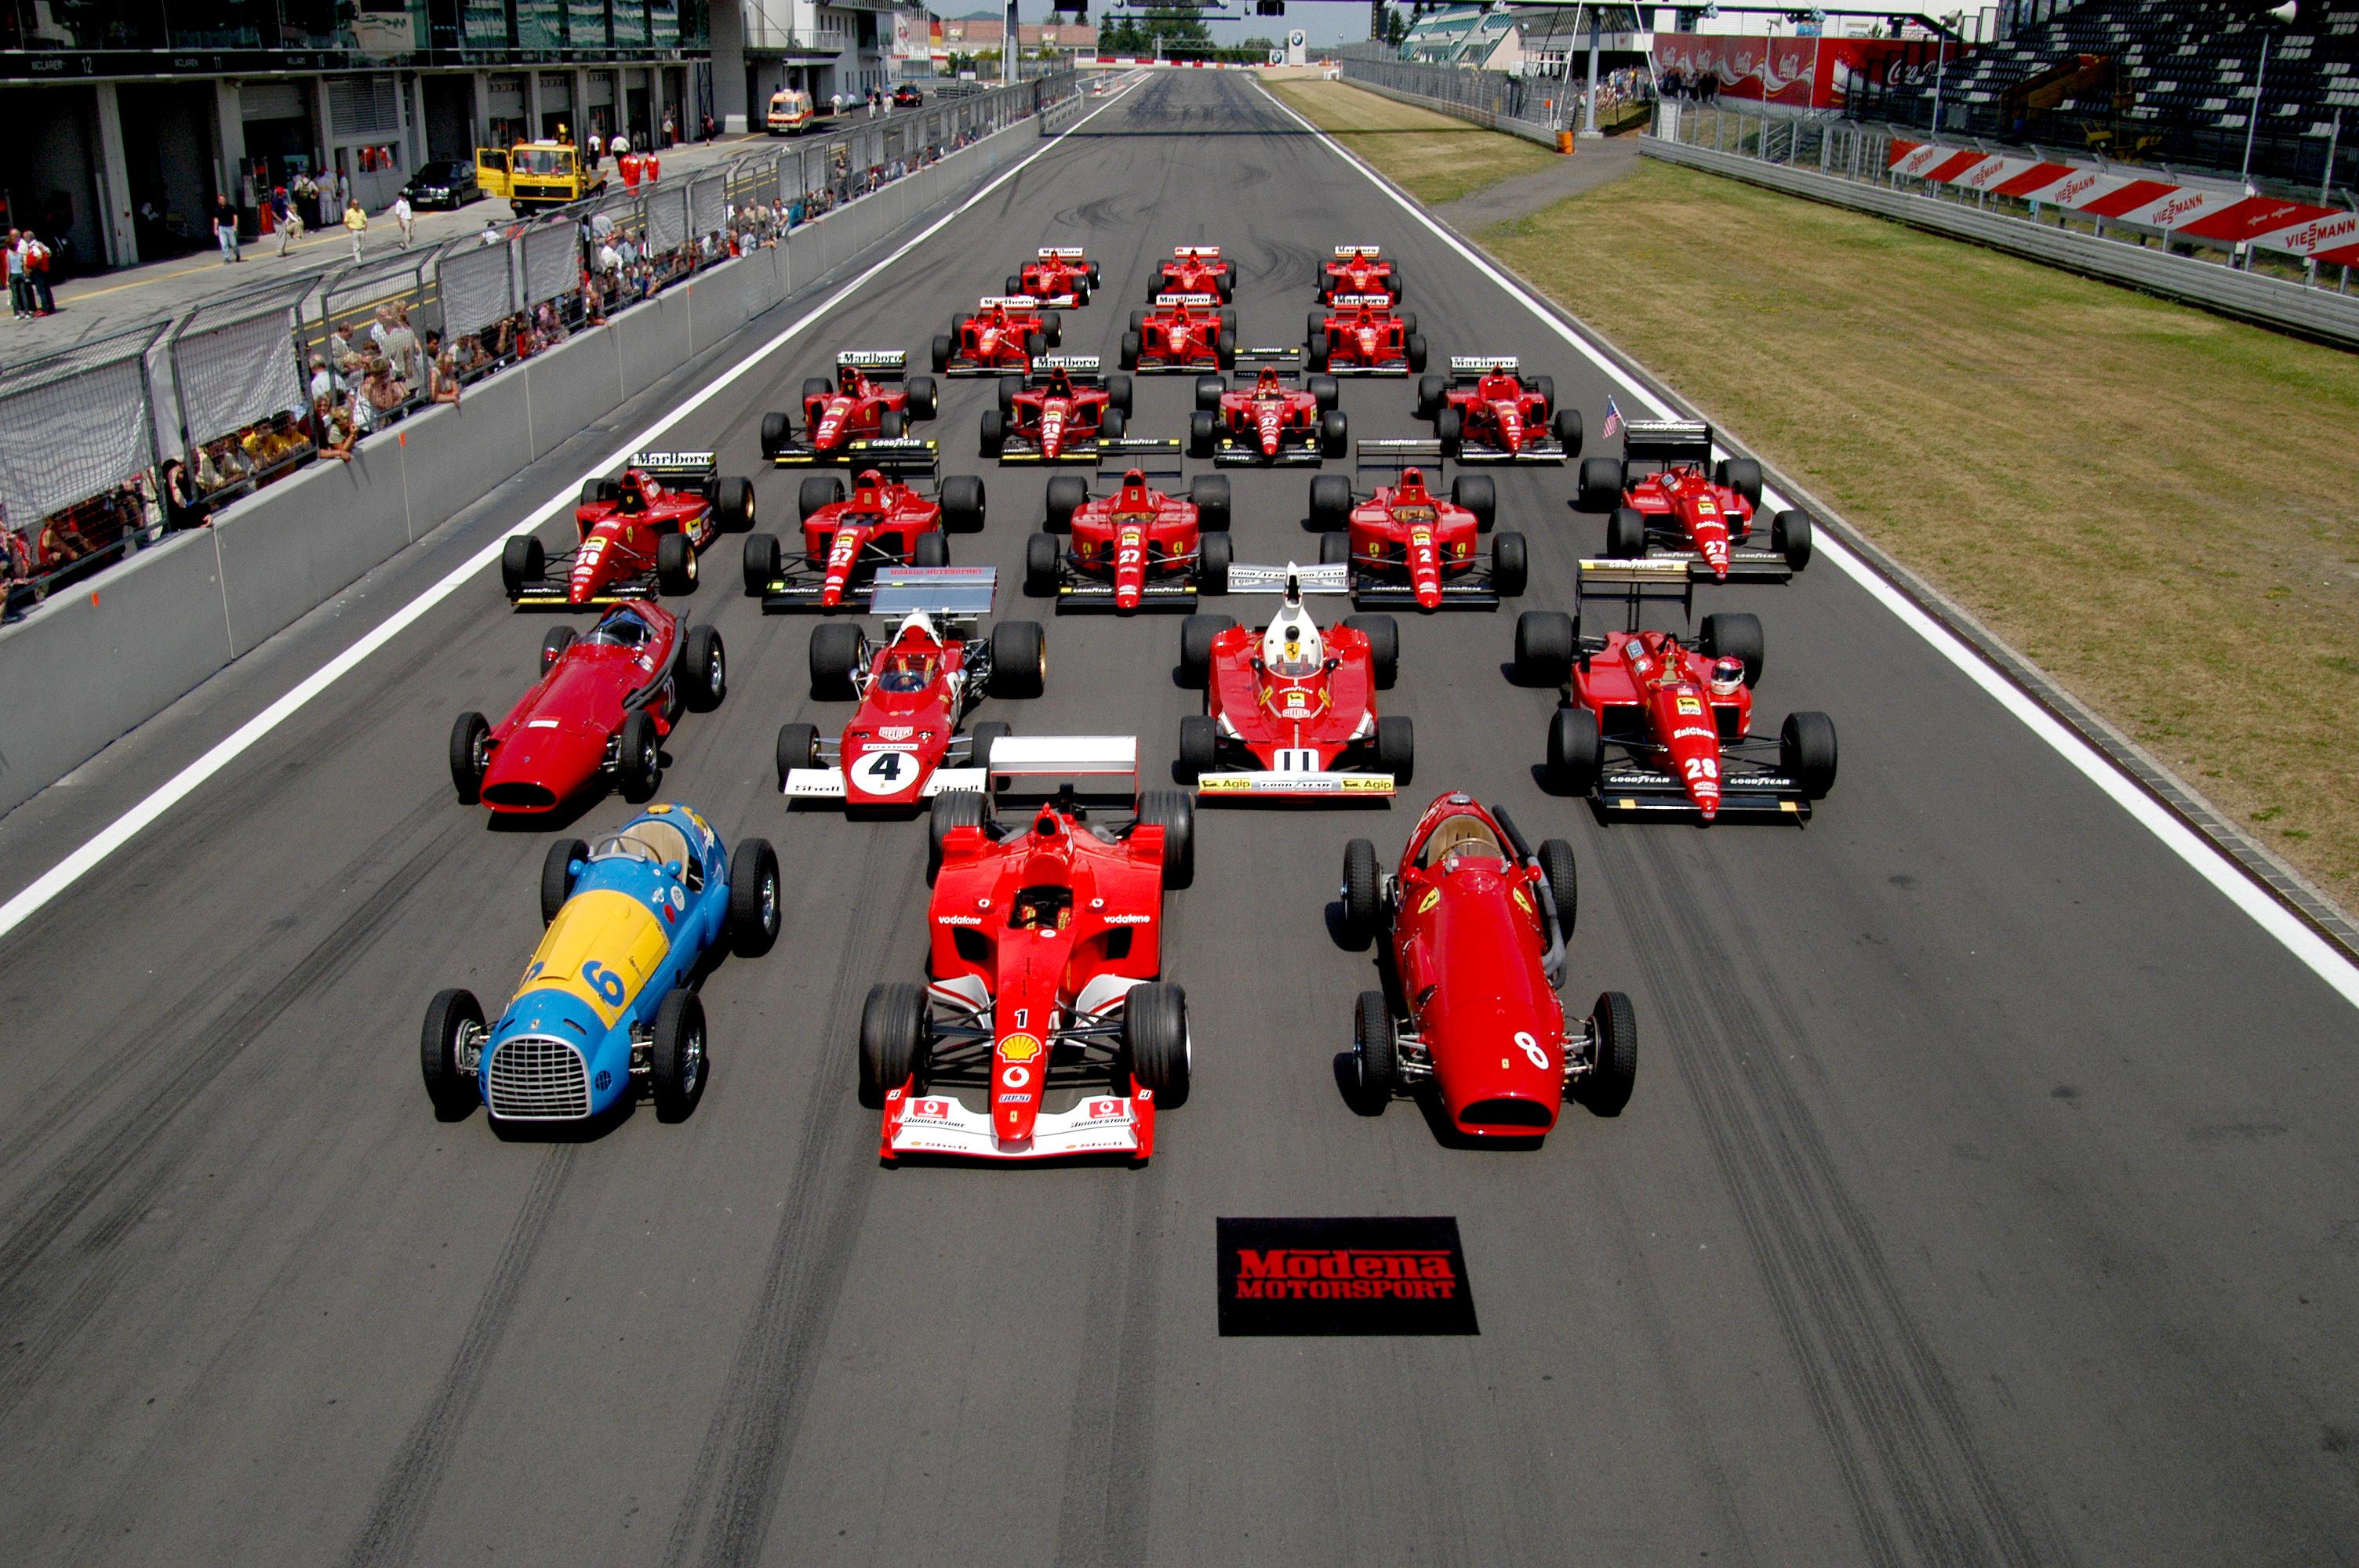 ferrari_formula_1_lineup_at_the_nurburgring.jpg